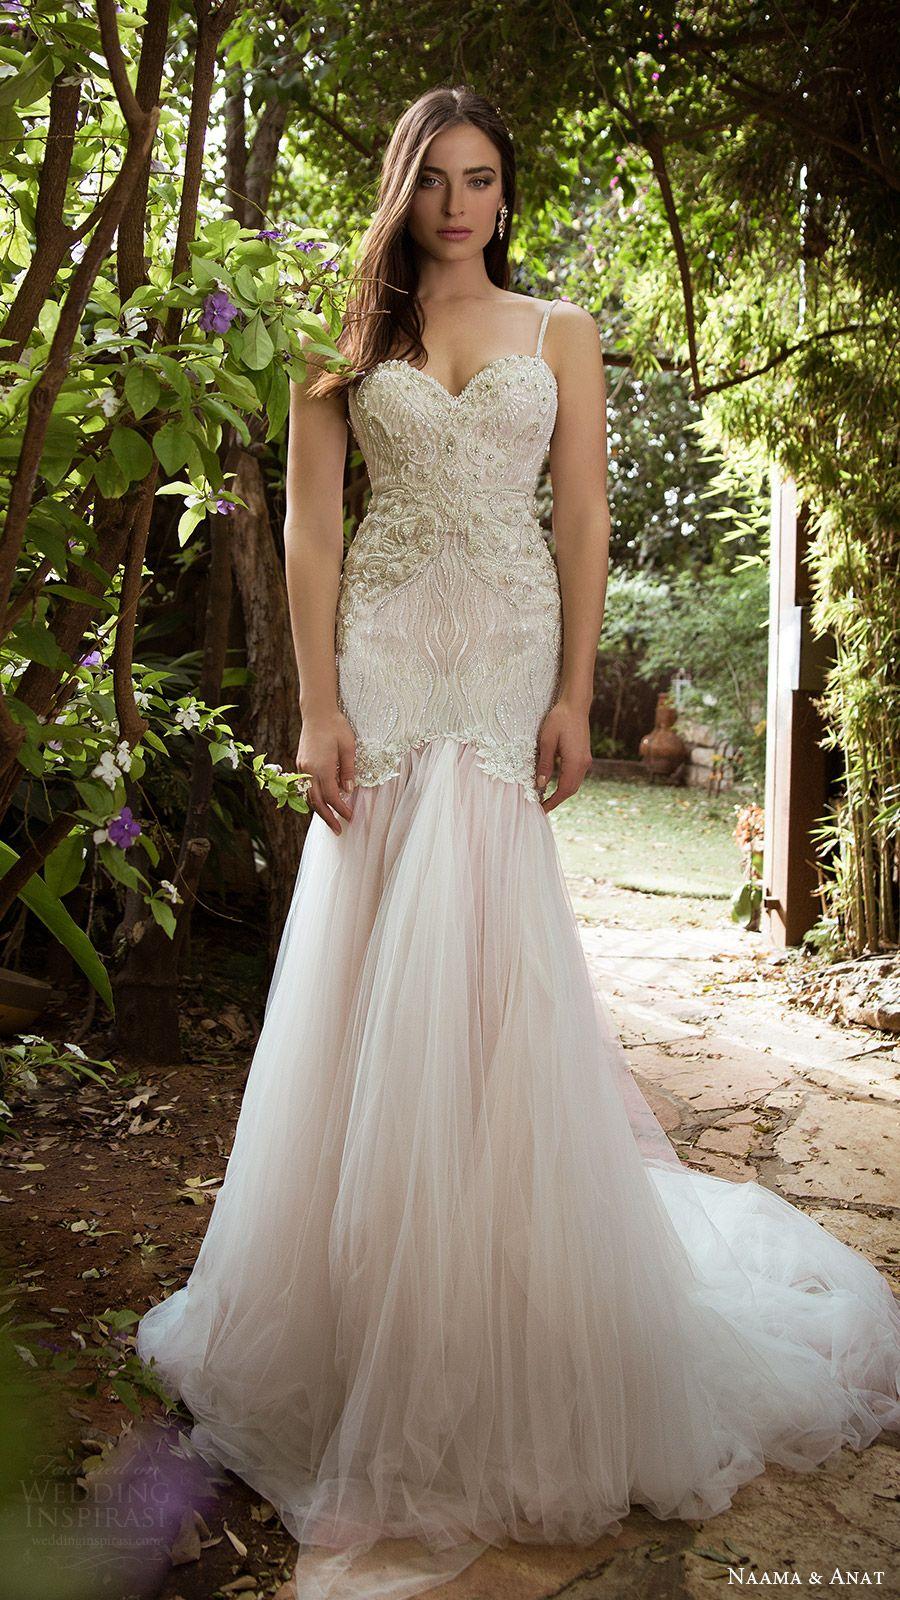 Mermaid lace wedding dress  Naama u Anat  Wedding Dresses u Primavera Bridal Collection